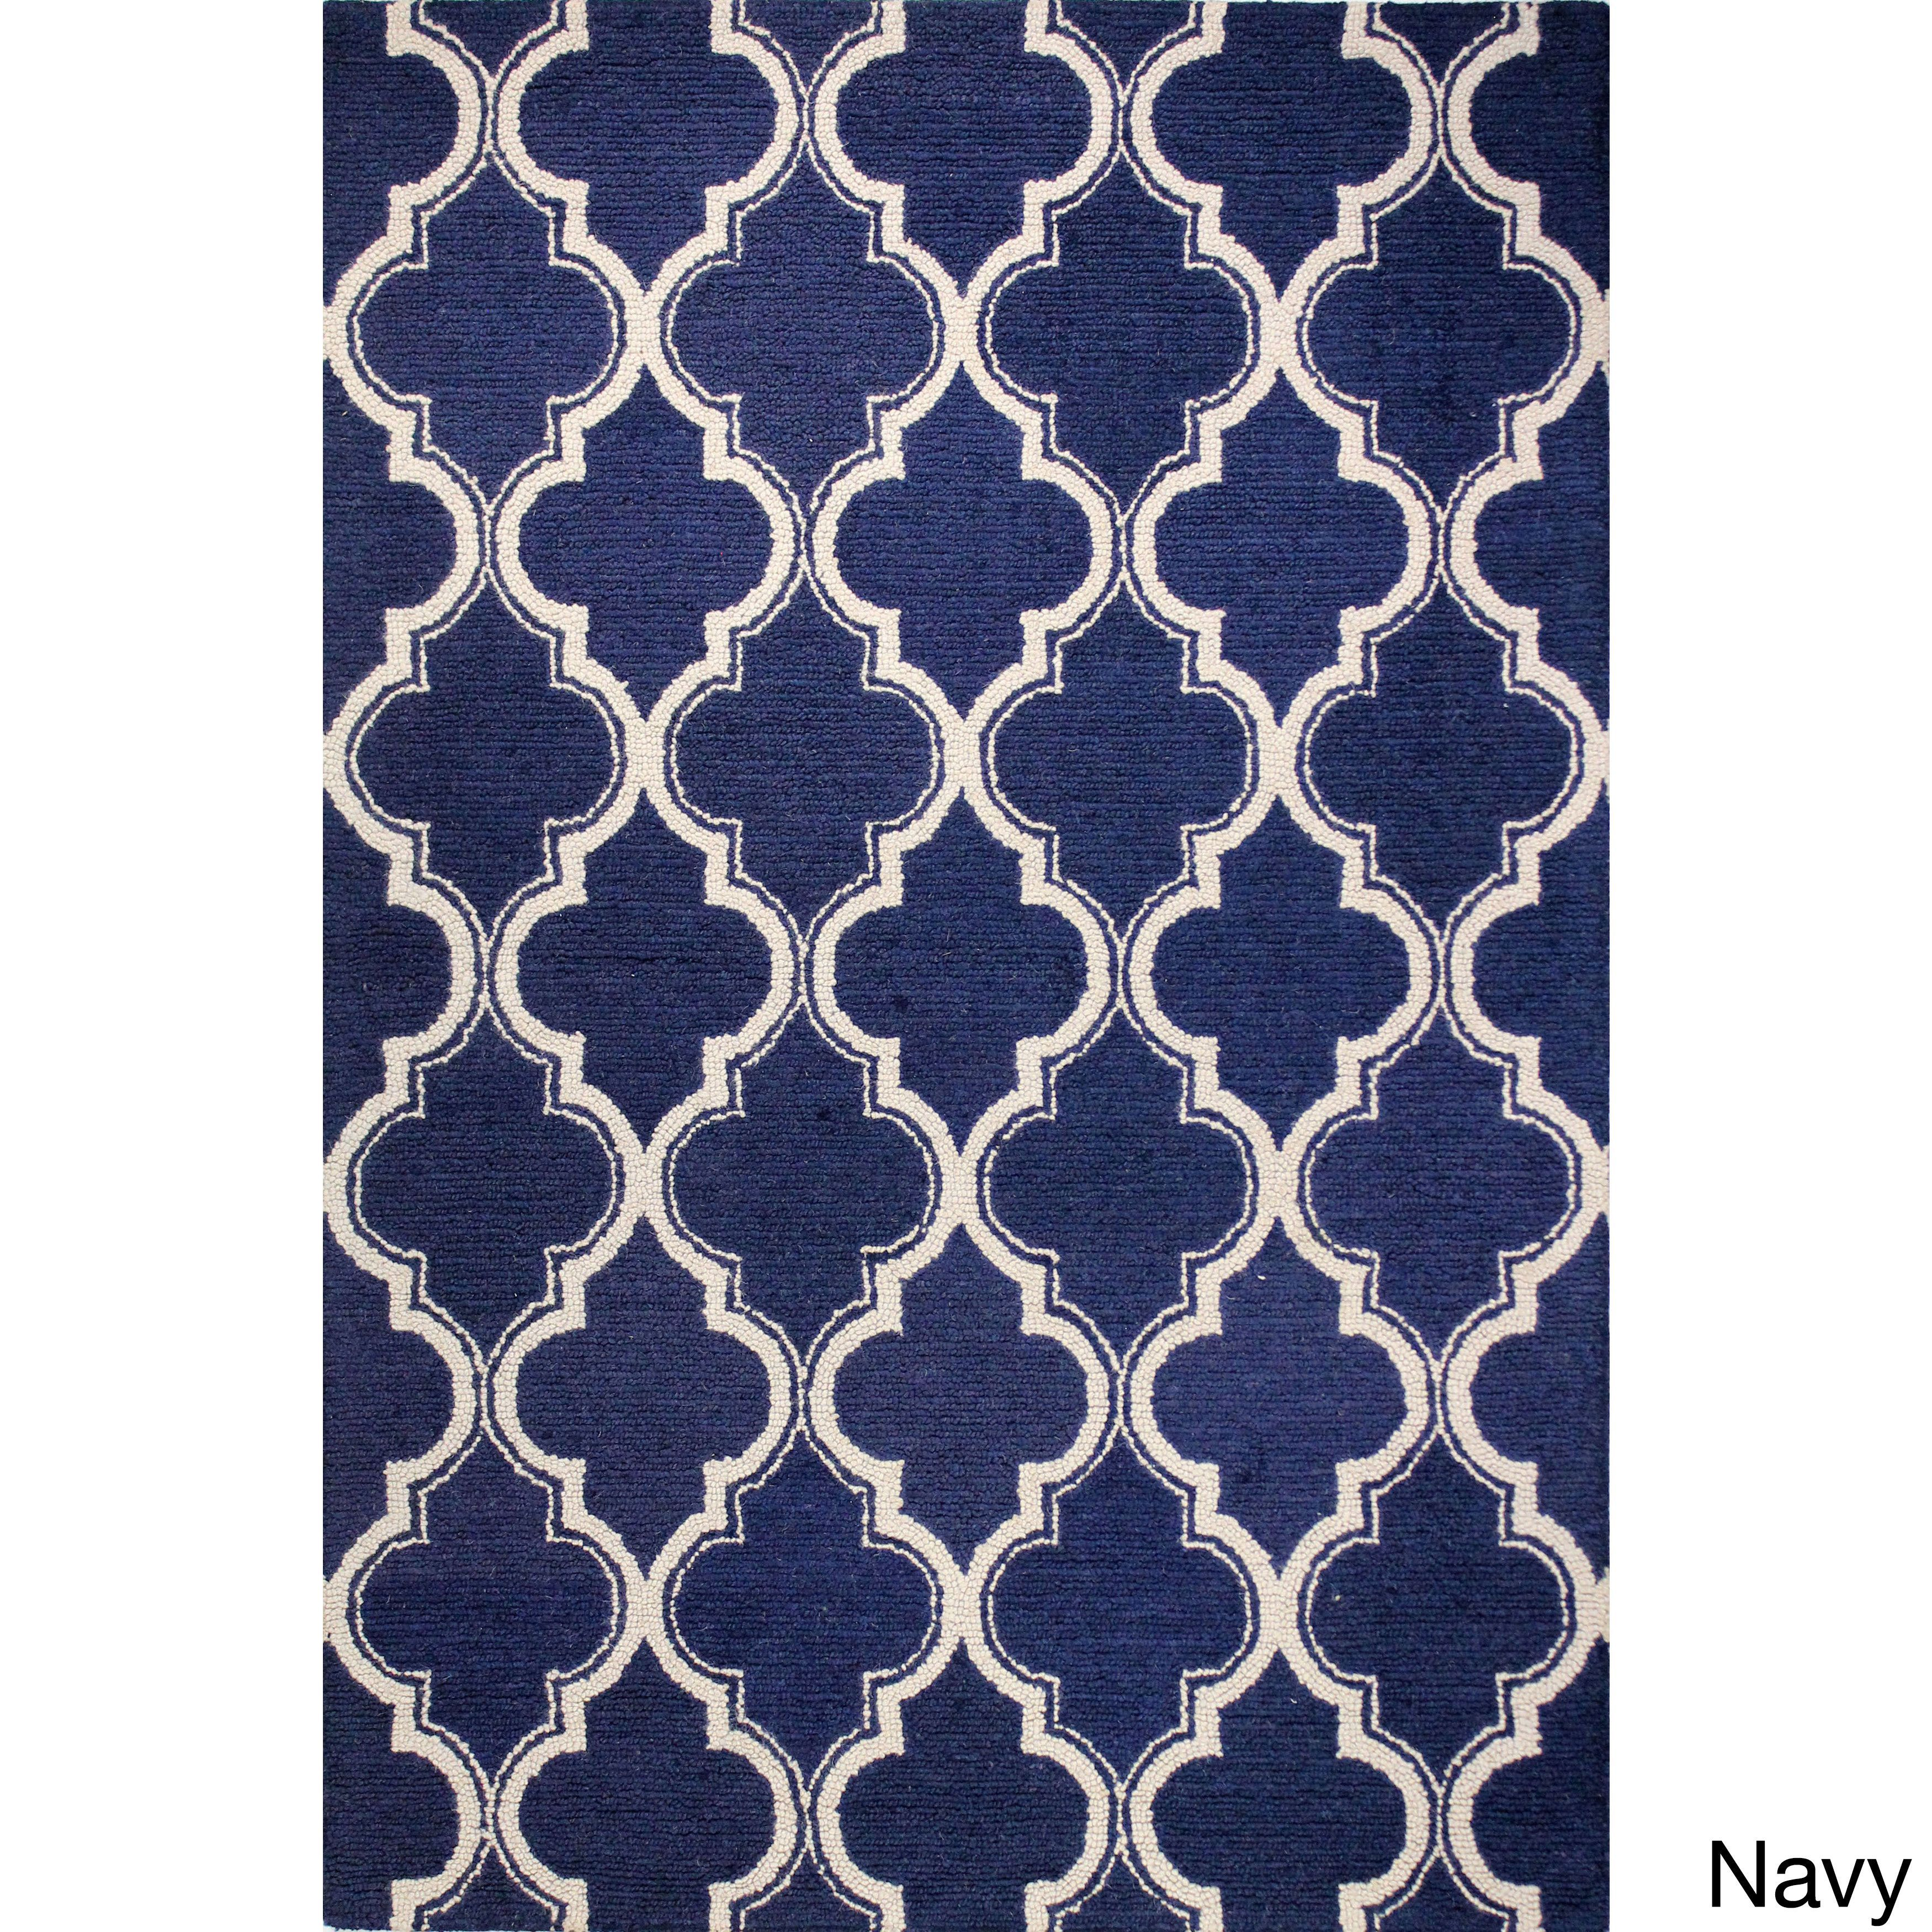 Sophia Tufted Wool Area Rug 7 X 9 Navy Blue Size 7 X 9